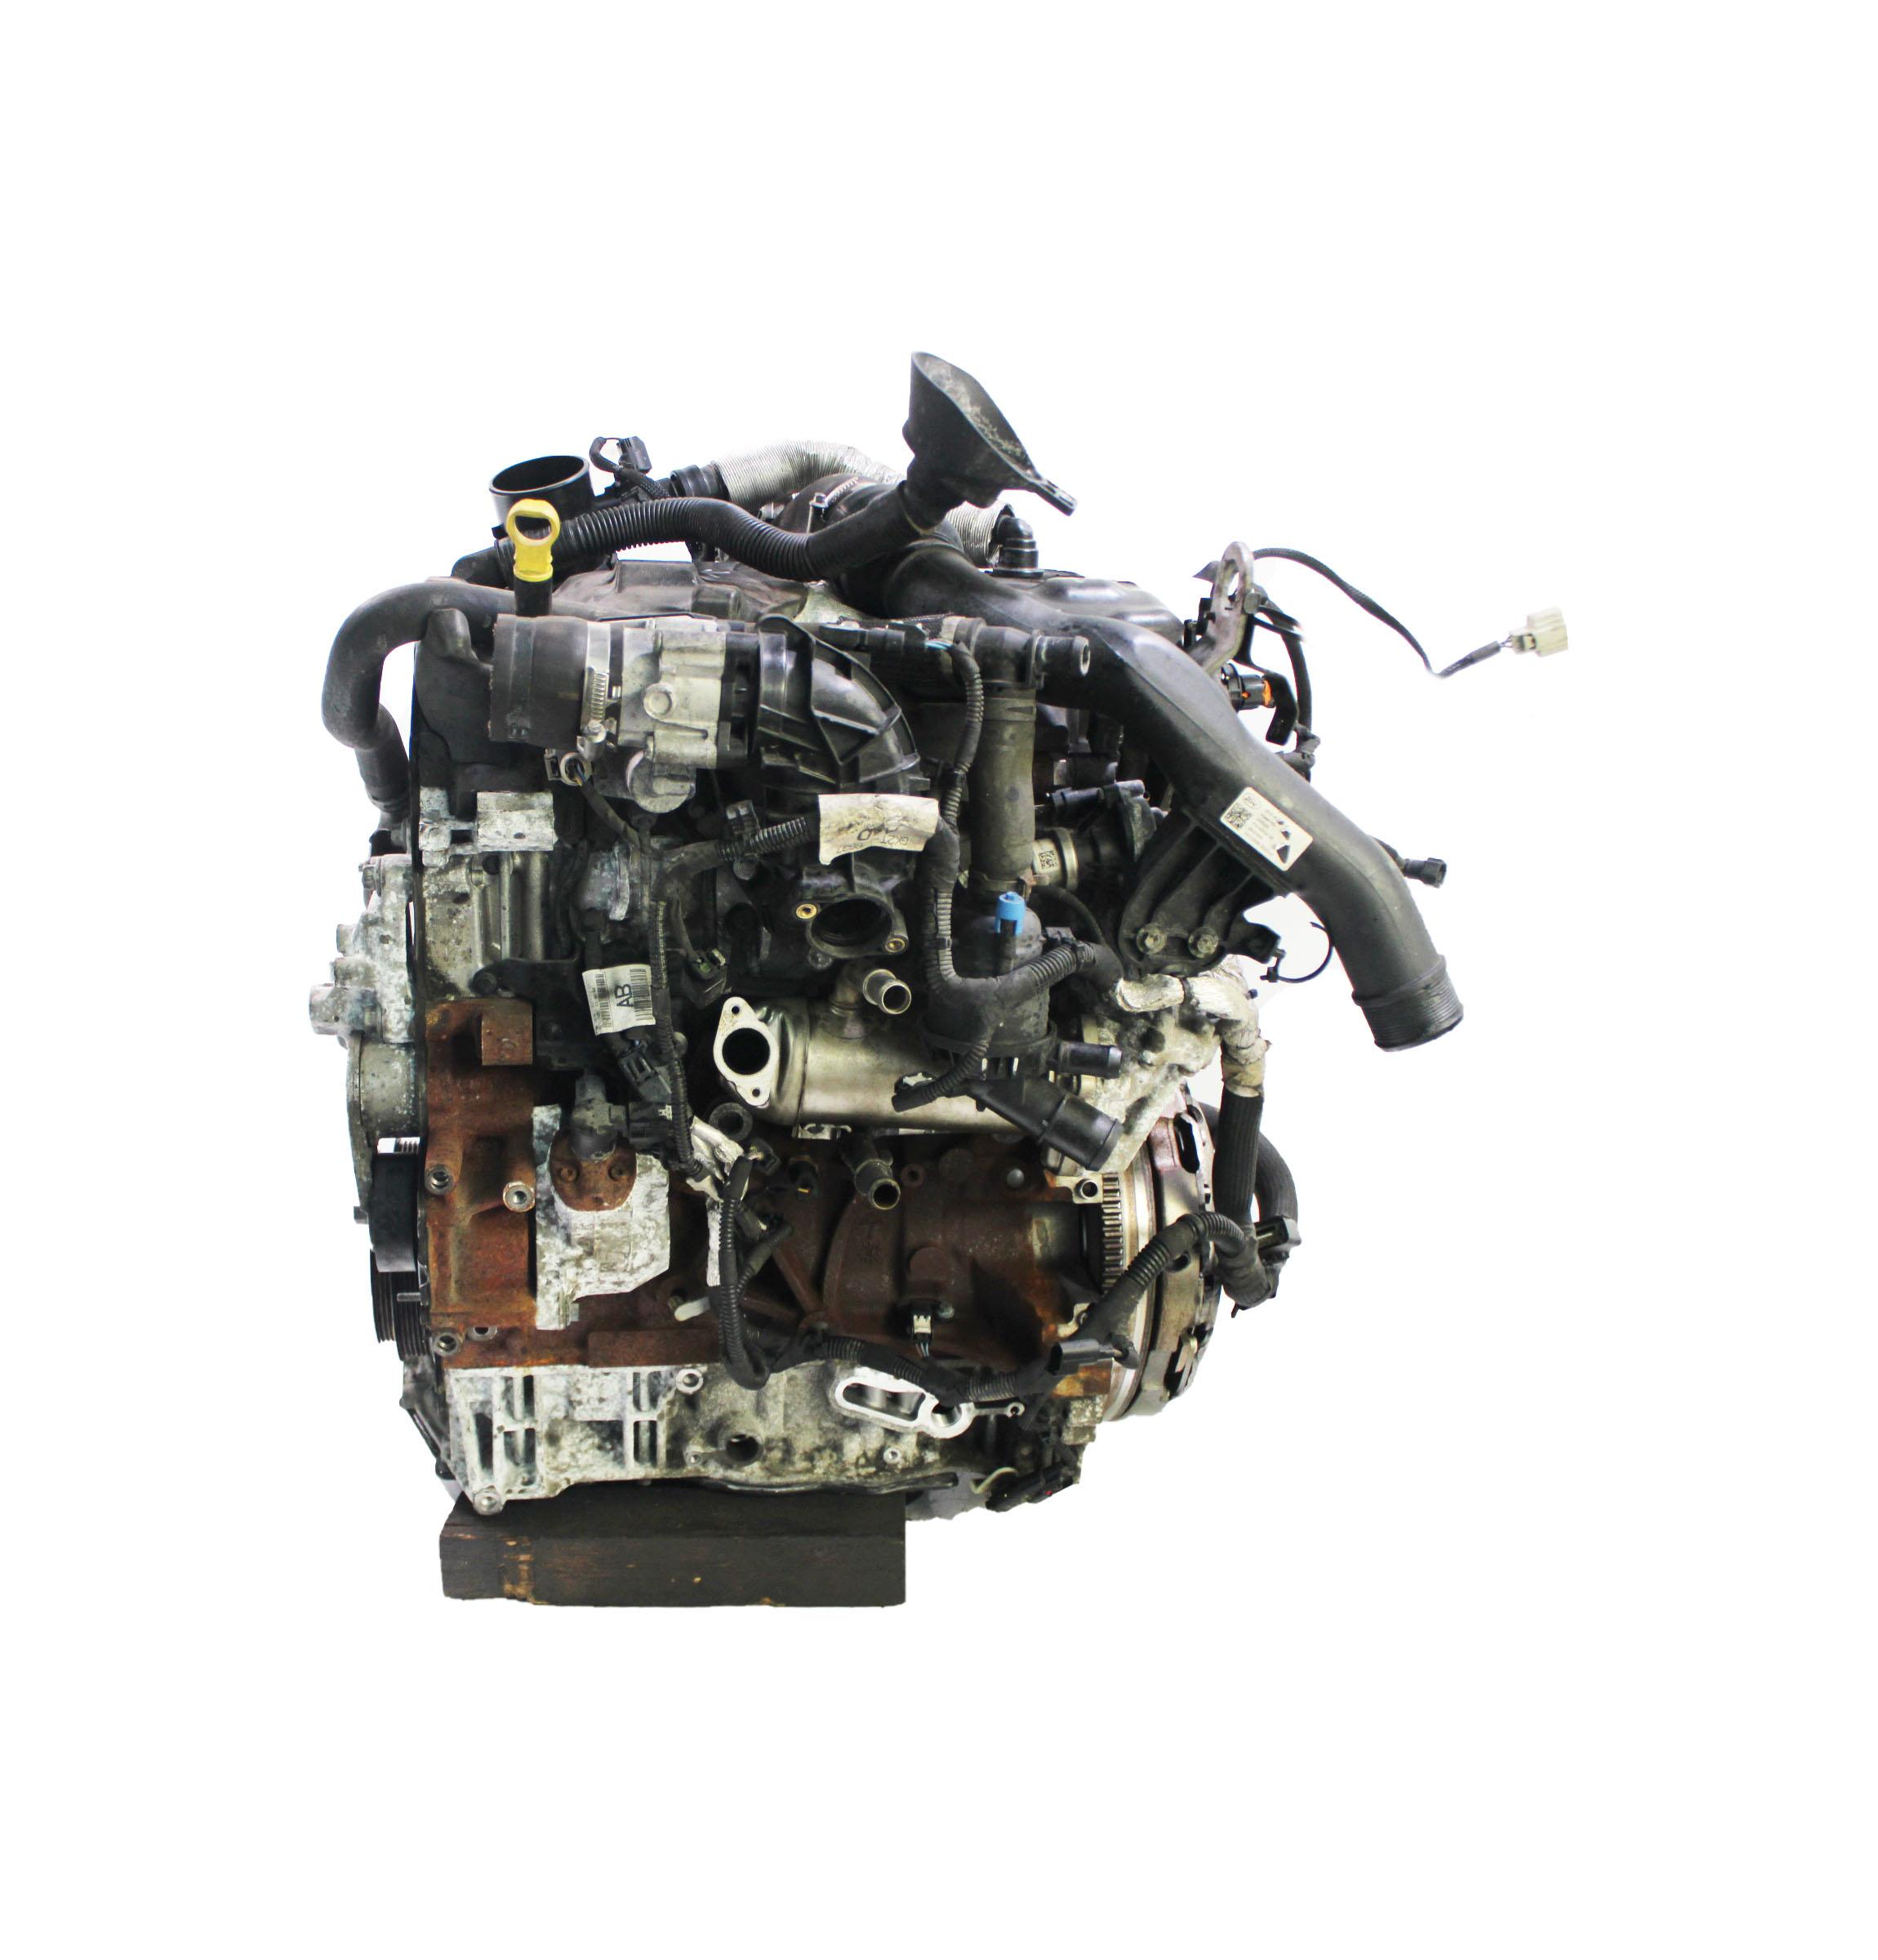 Motor für Ford Transit V363 2,0 EcoBlue Diesel YMF6 130 PS